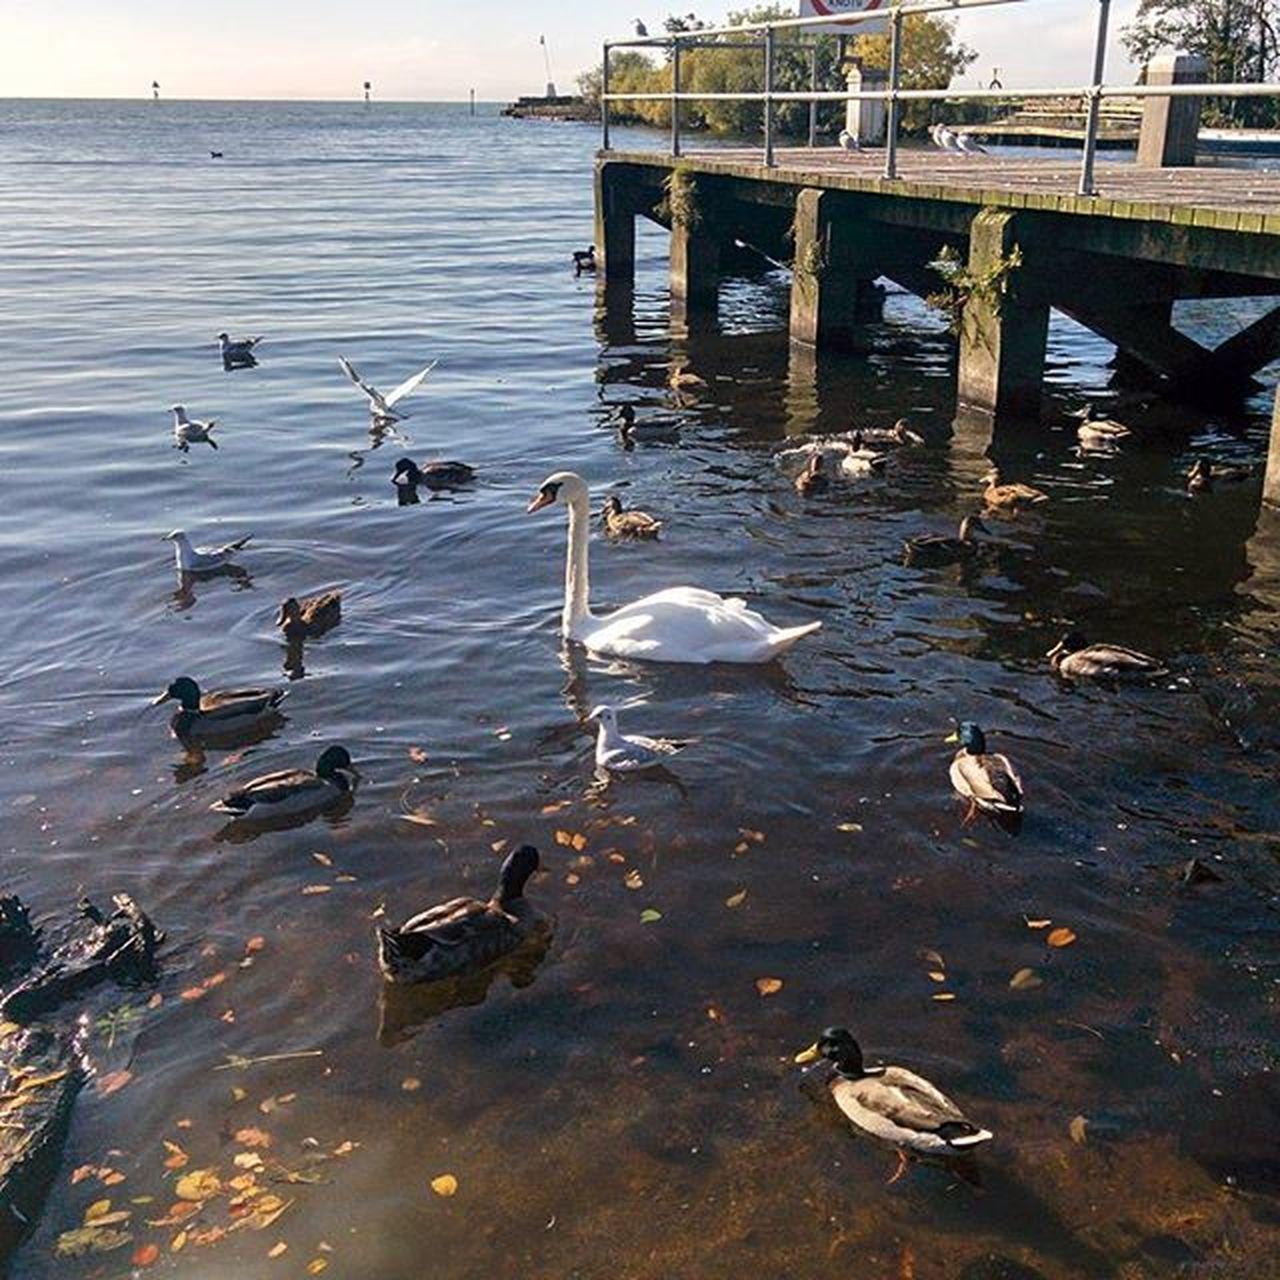 Lough Neagh Antrim Ireland Swan Duck Pier